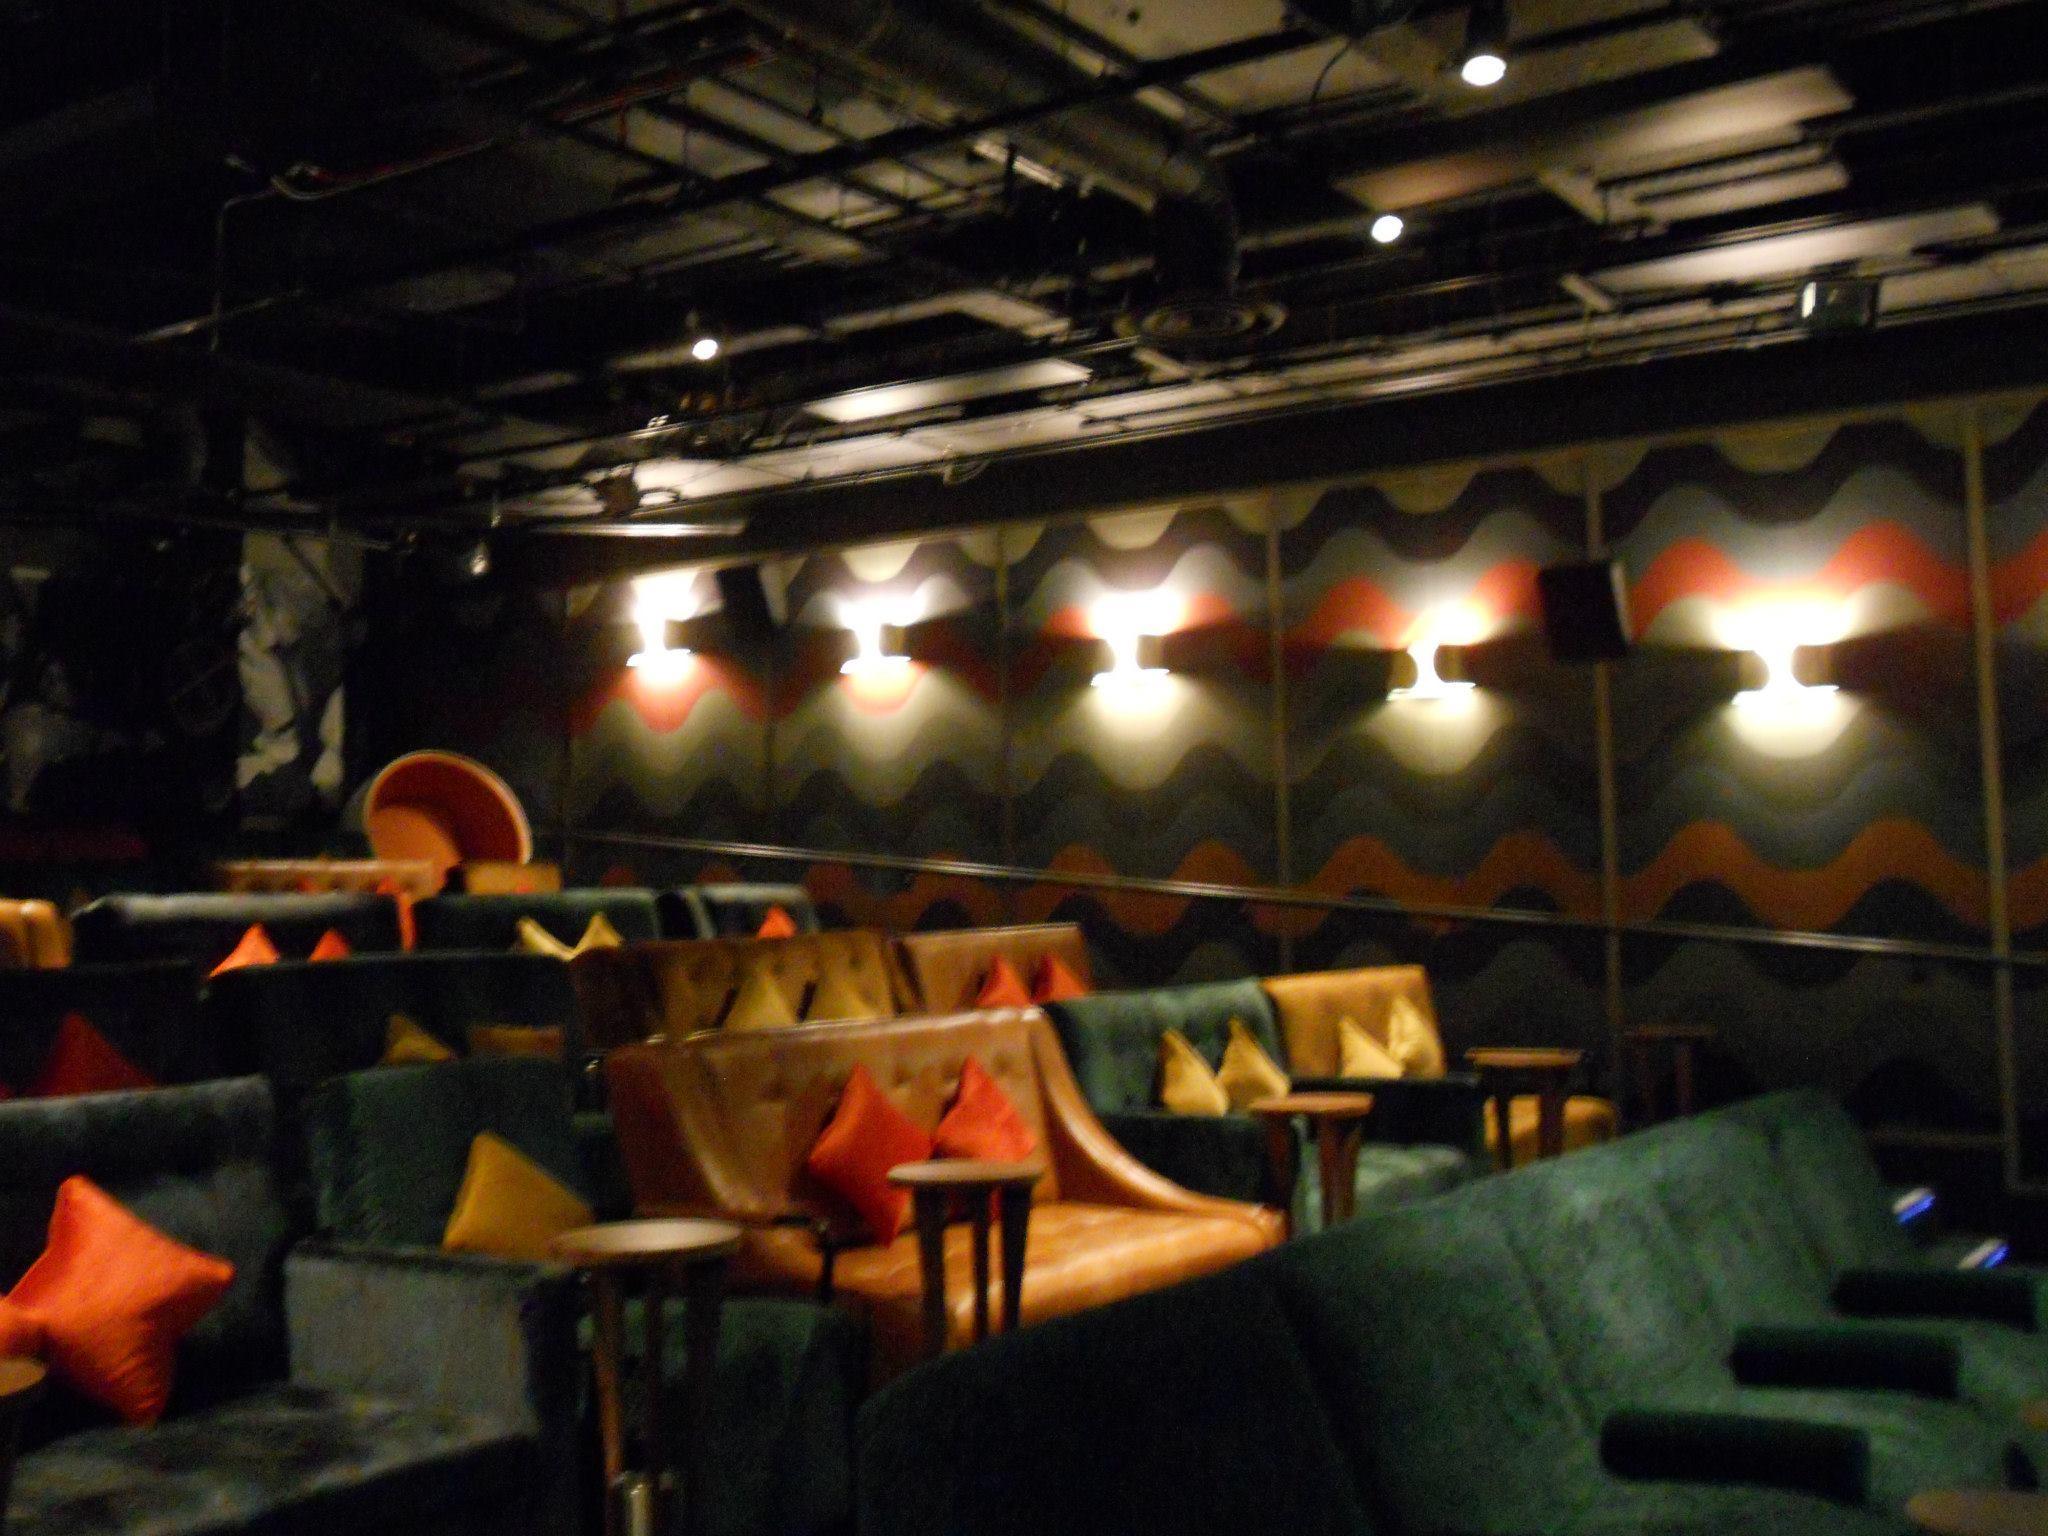 selfridges-everyman-cinema-intimate-atmosphere